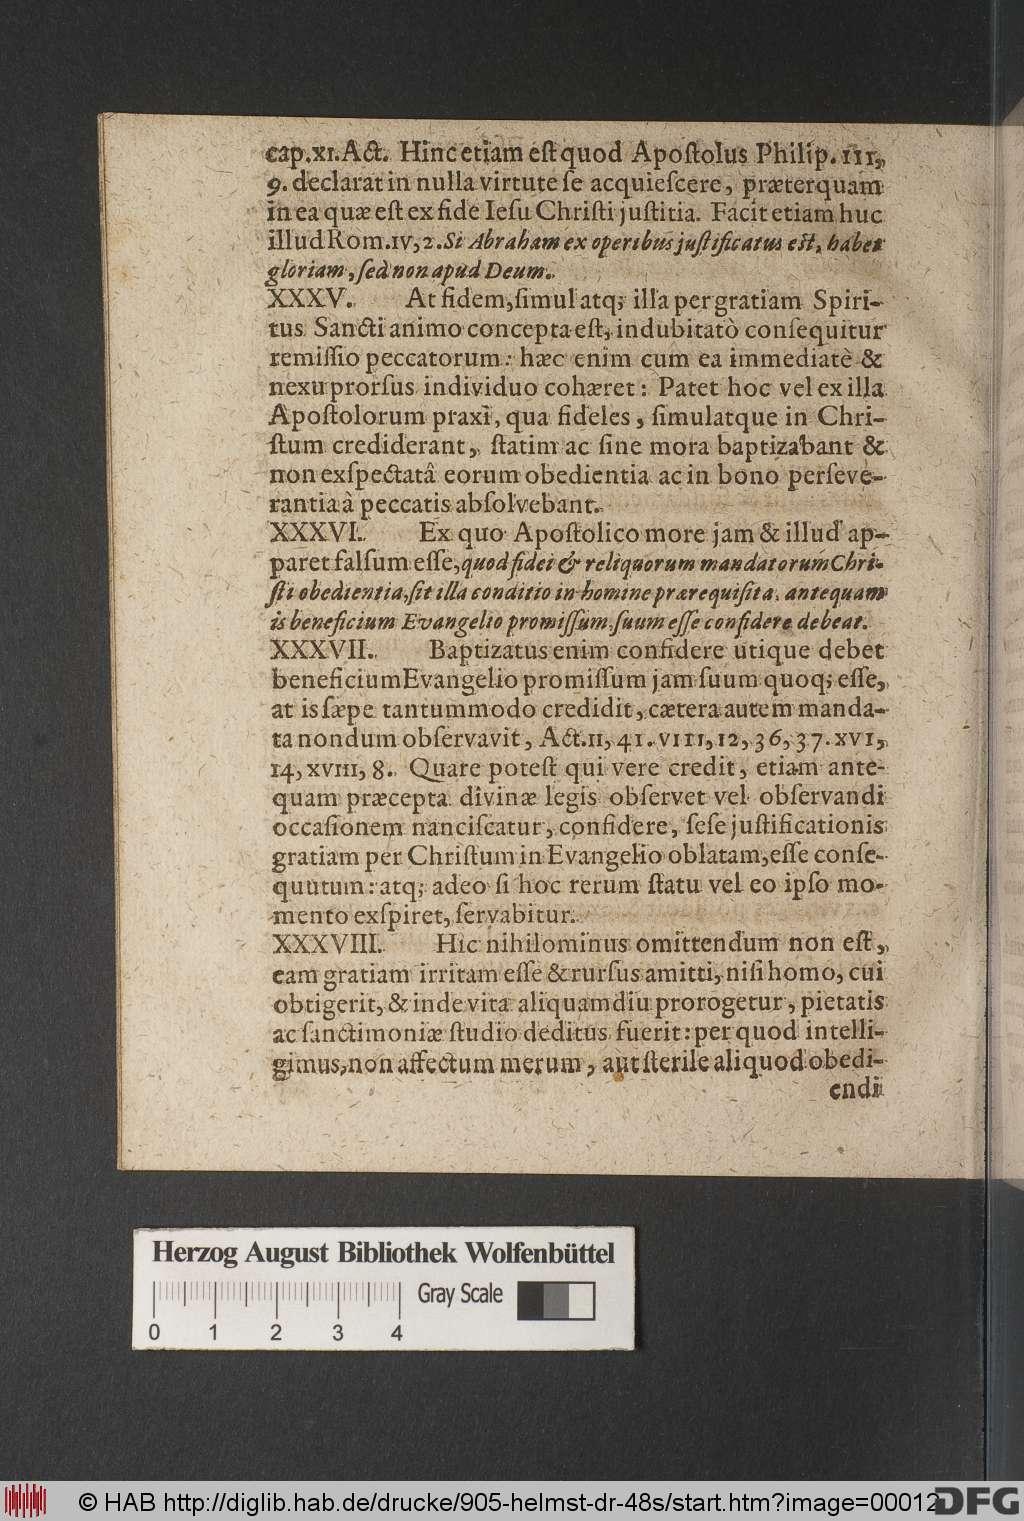 https://diglib.hab.de/drucke/905-helmst-dr-48s/00012.jpg